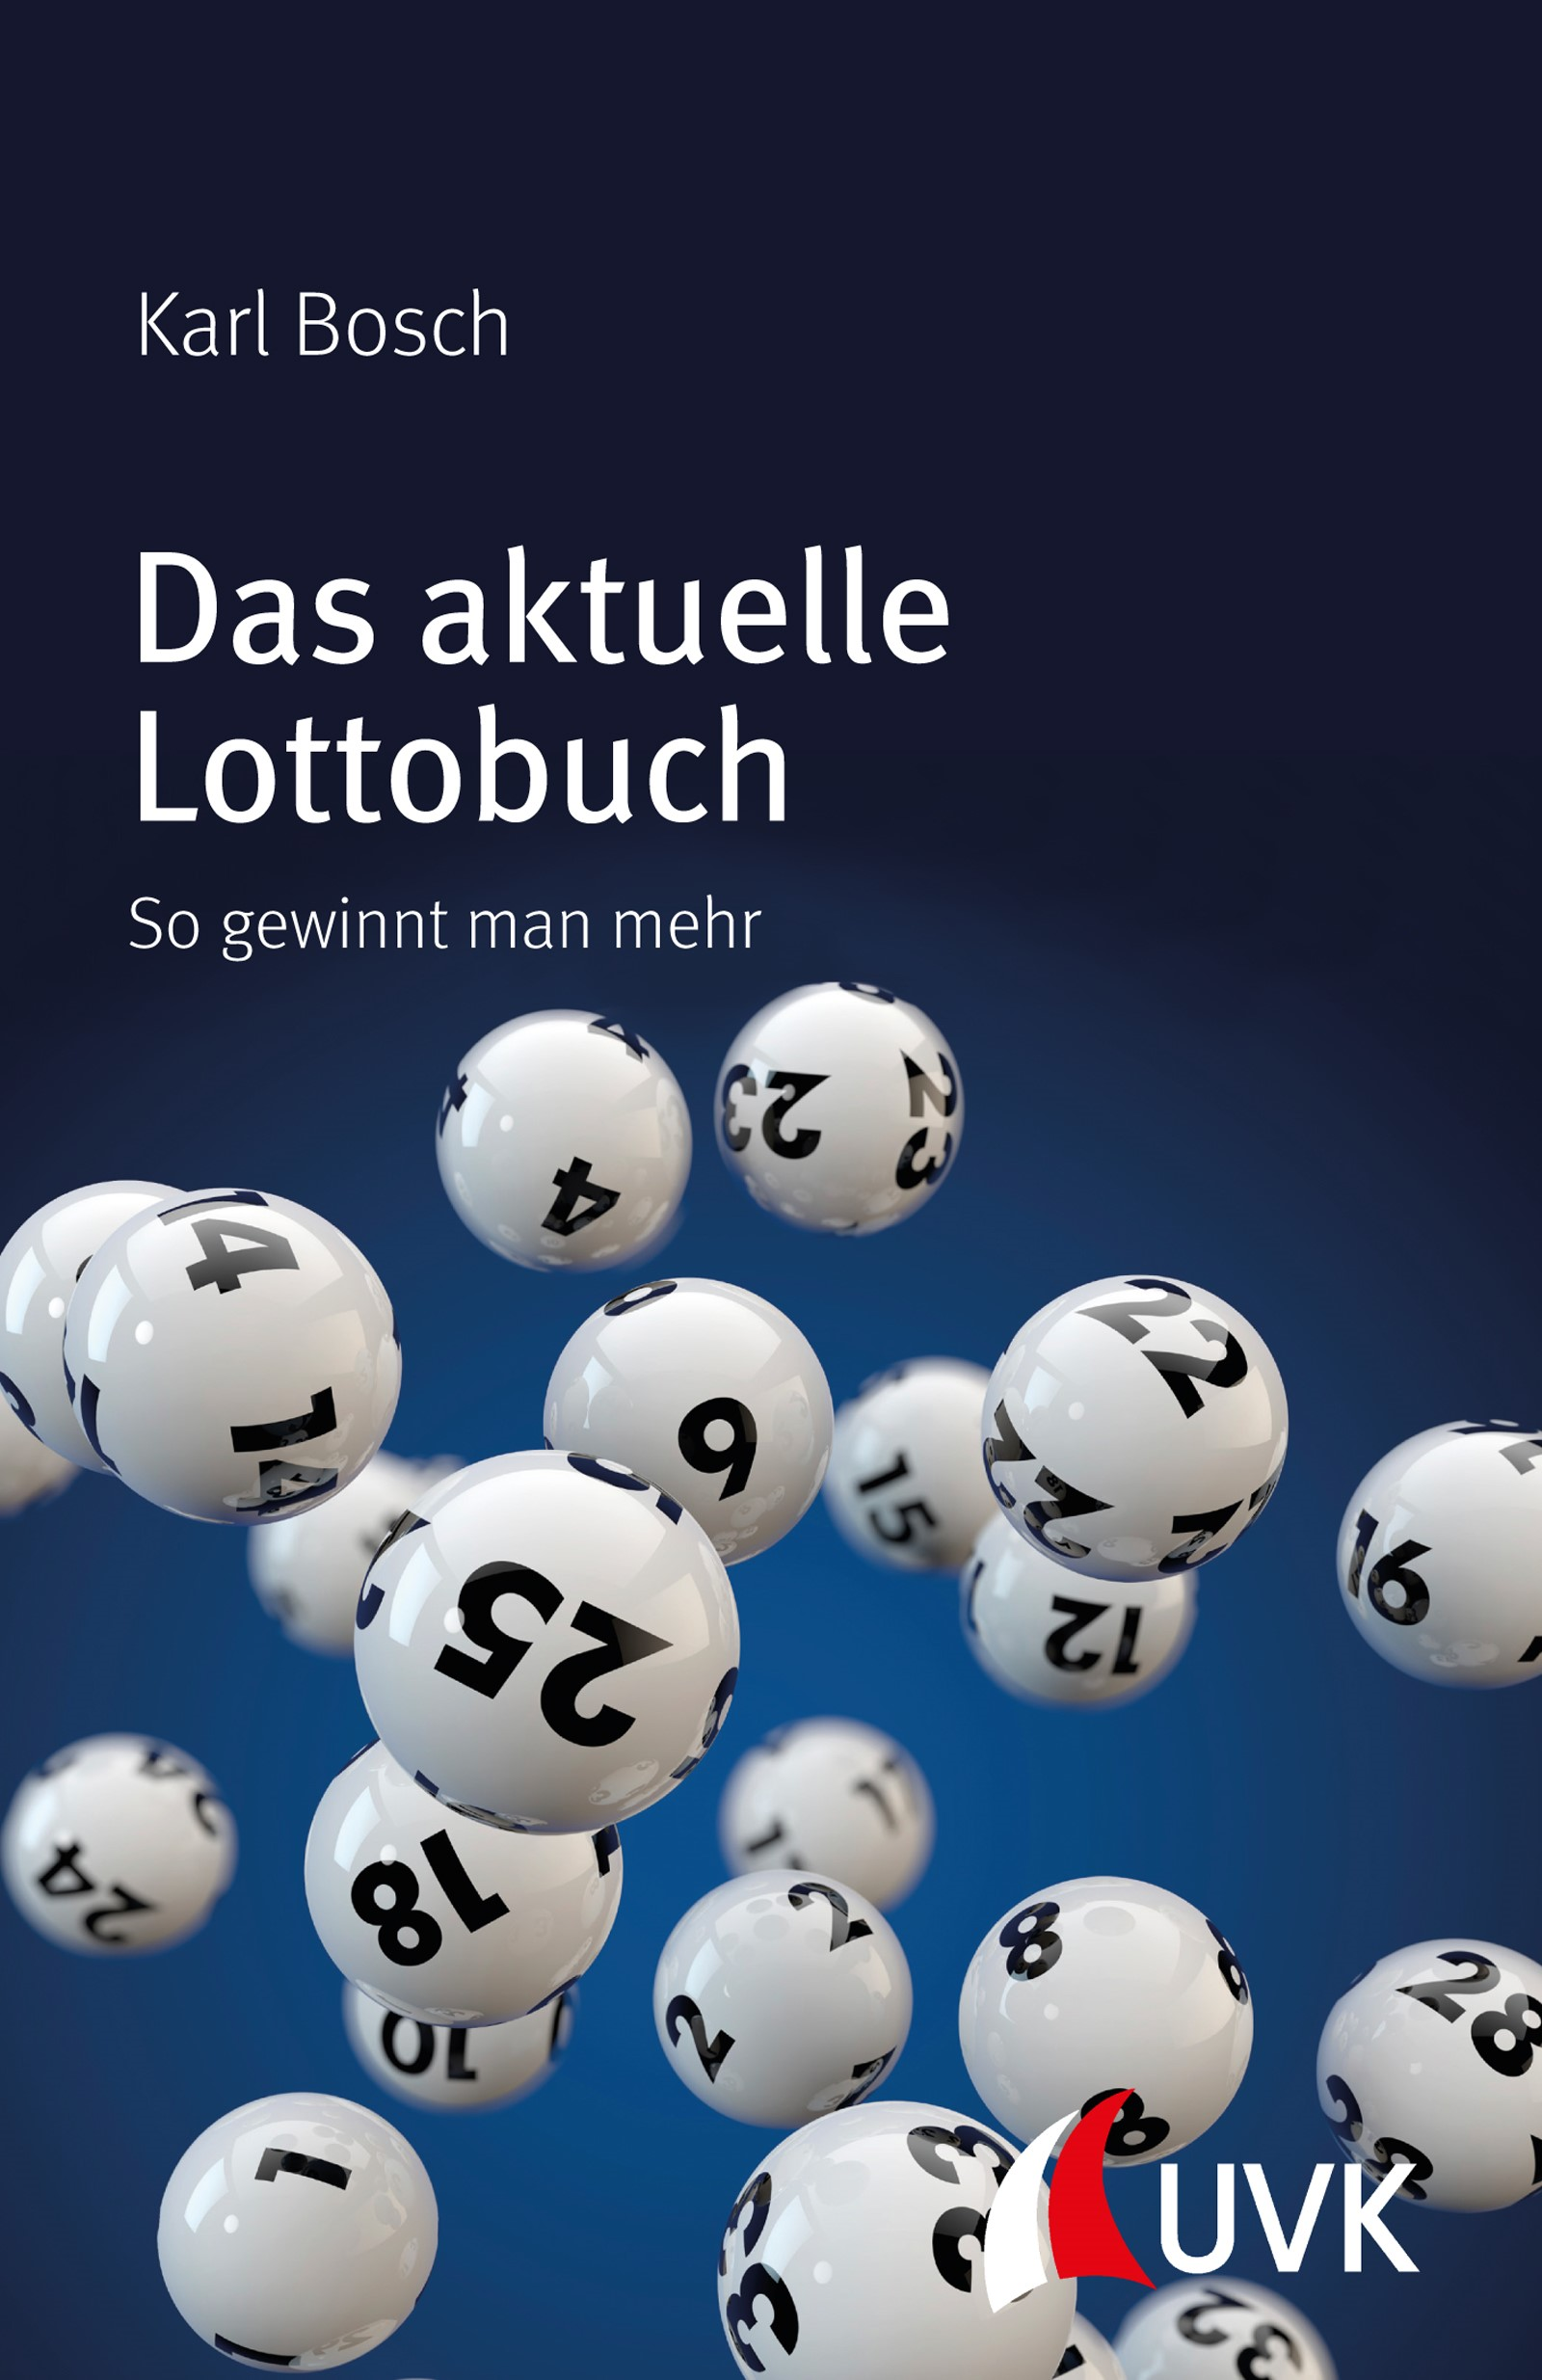 Das aktuelle Lottobuch | Bosch, 2015 | Buch (Cover)